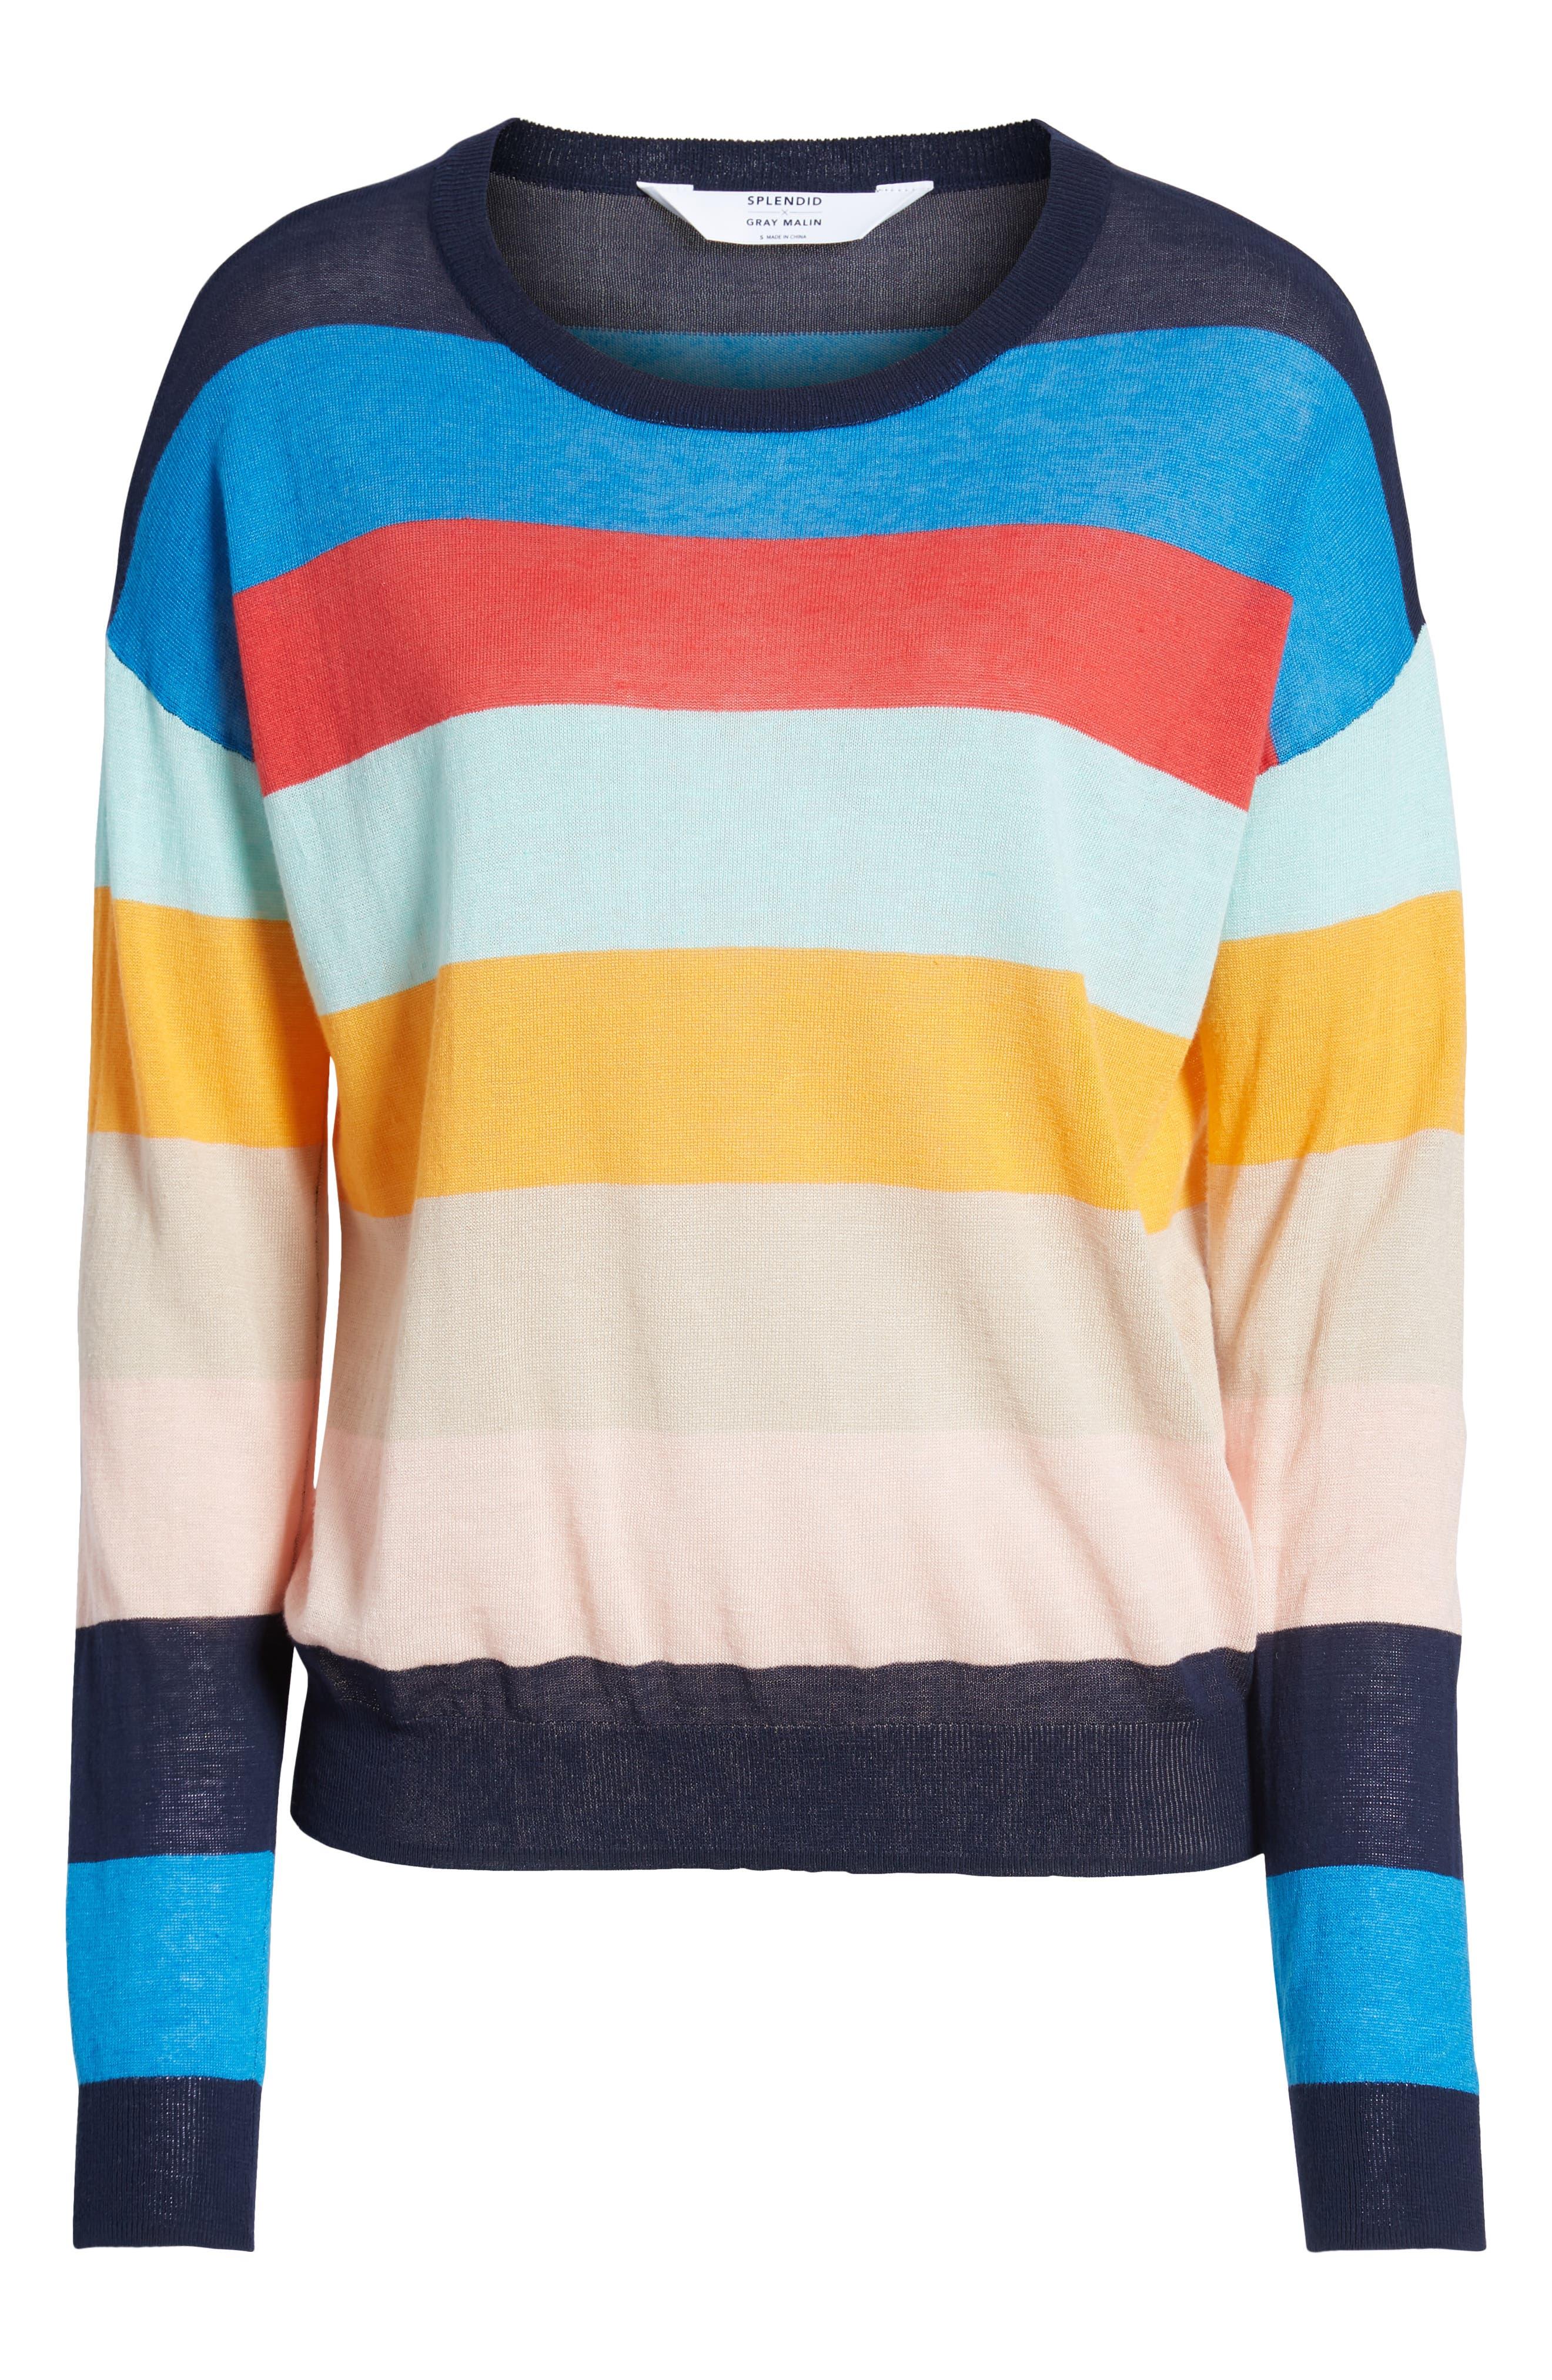 SPLENDID, Sunray Colorblock Sweater, Alternate thumbnail 6, color, BONFIRE MULTI